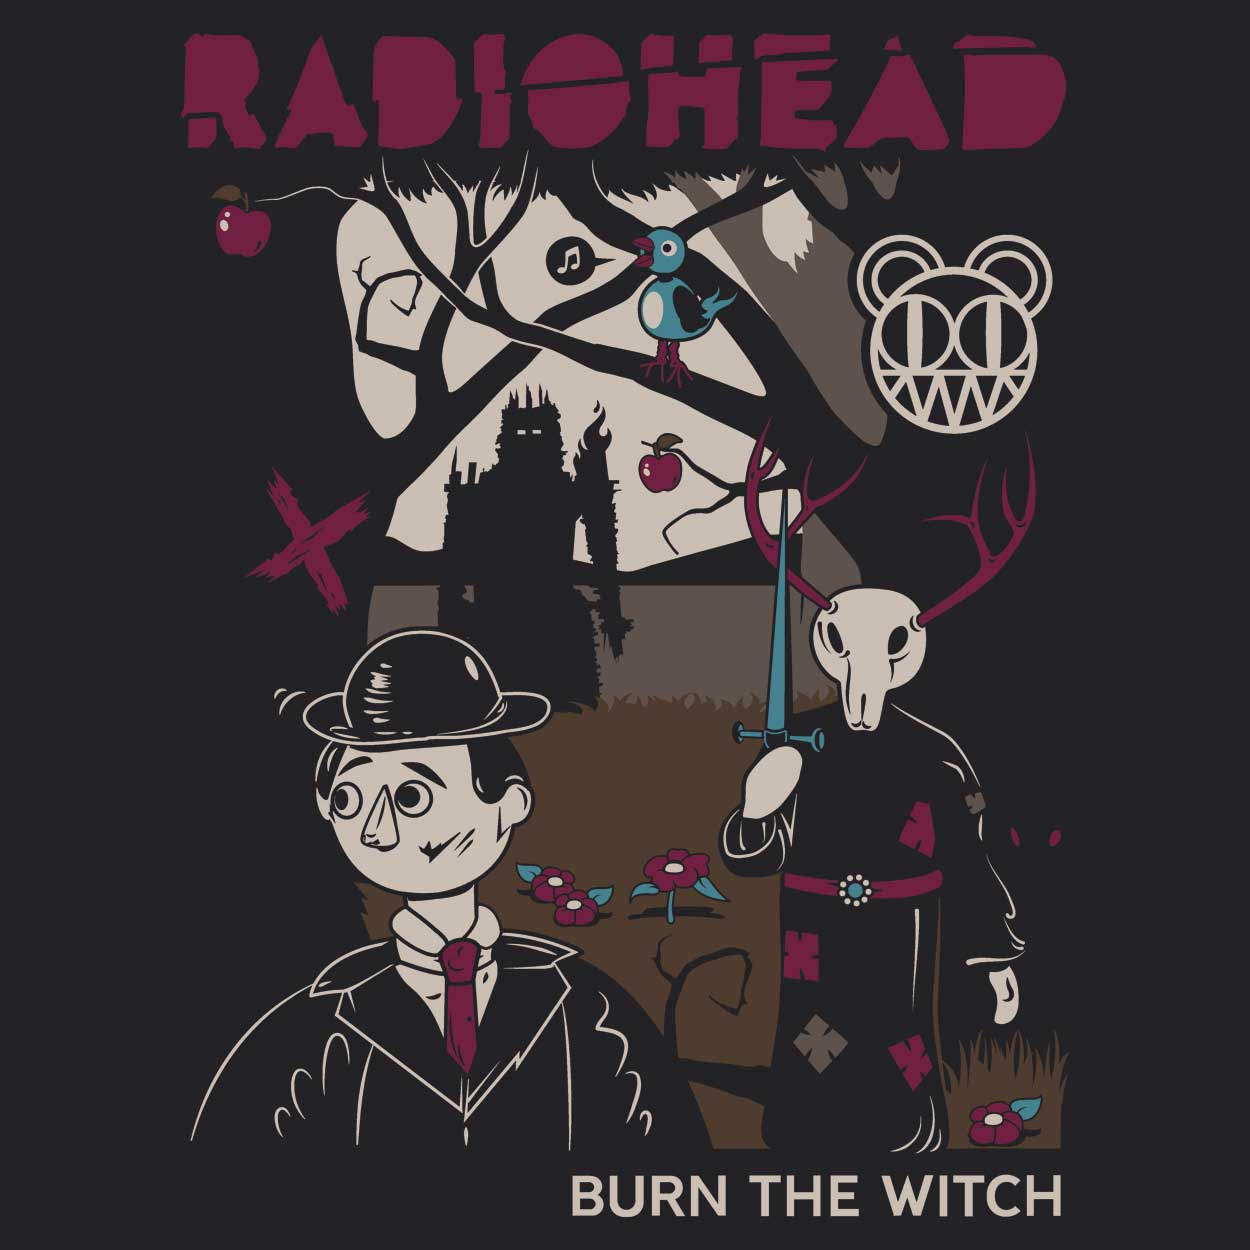 Camiseta Burn The Witch - Radiohead - Feminino